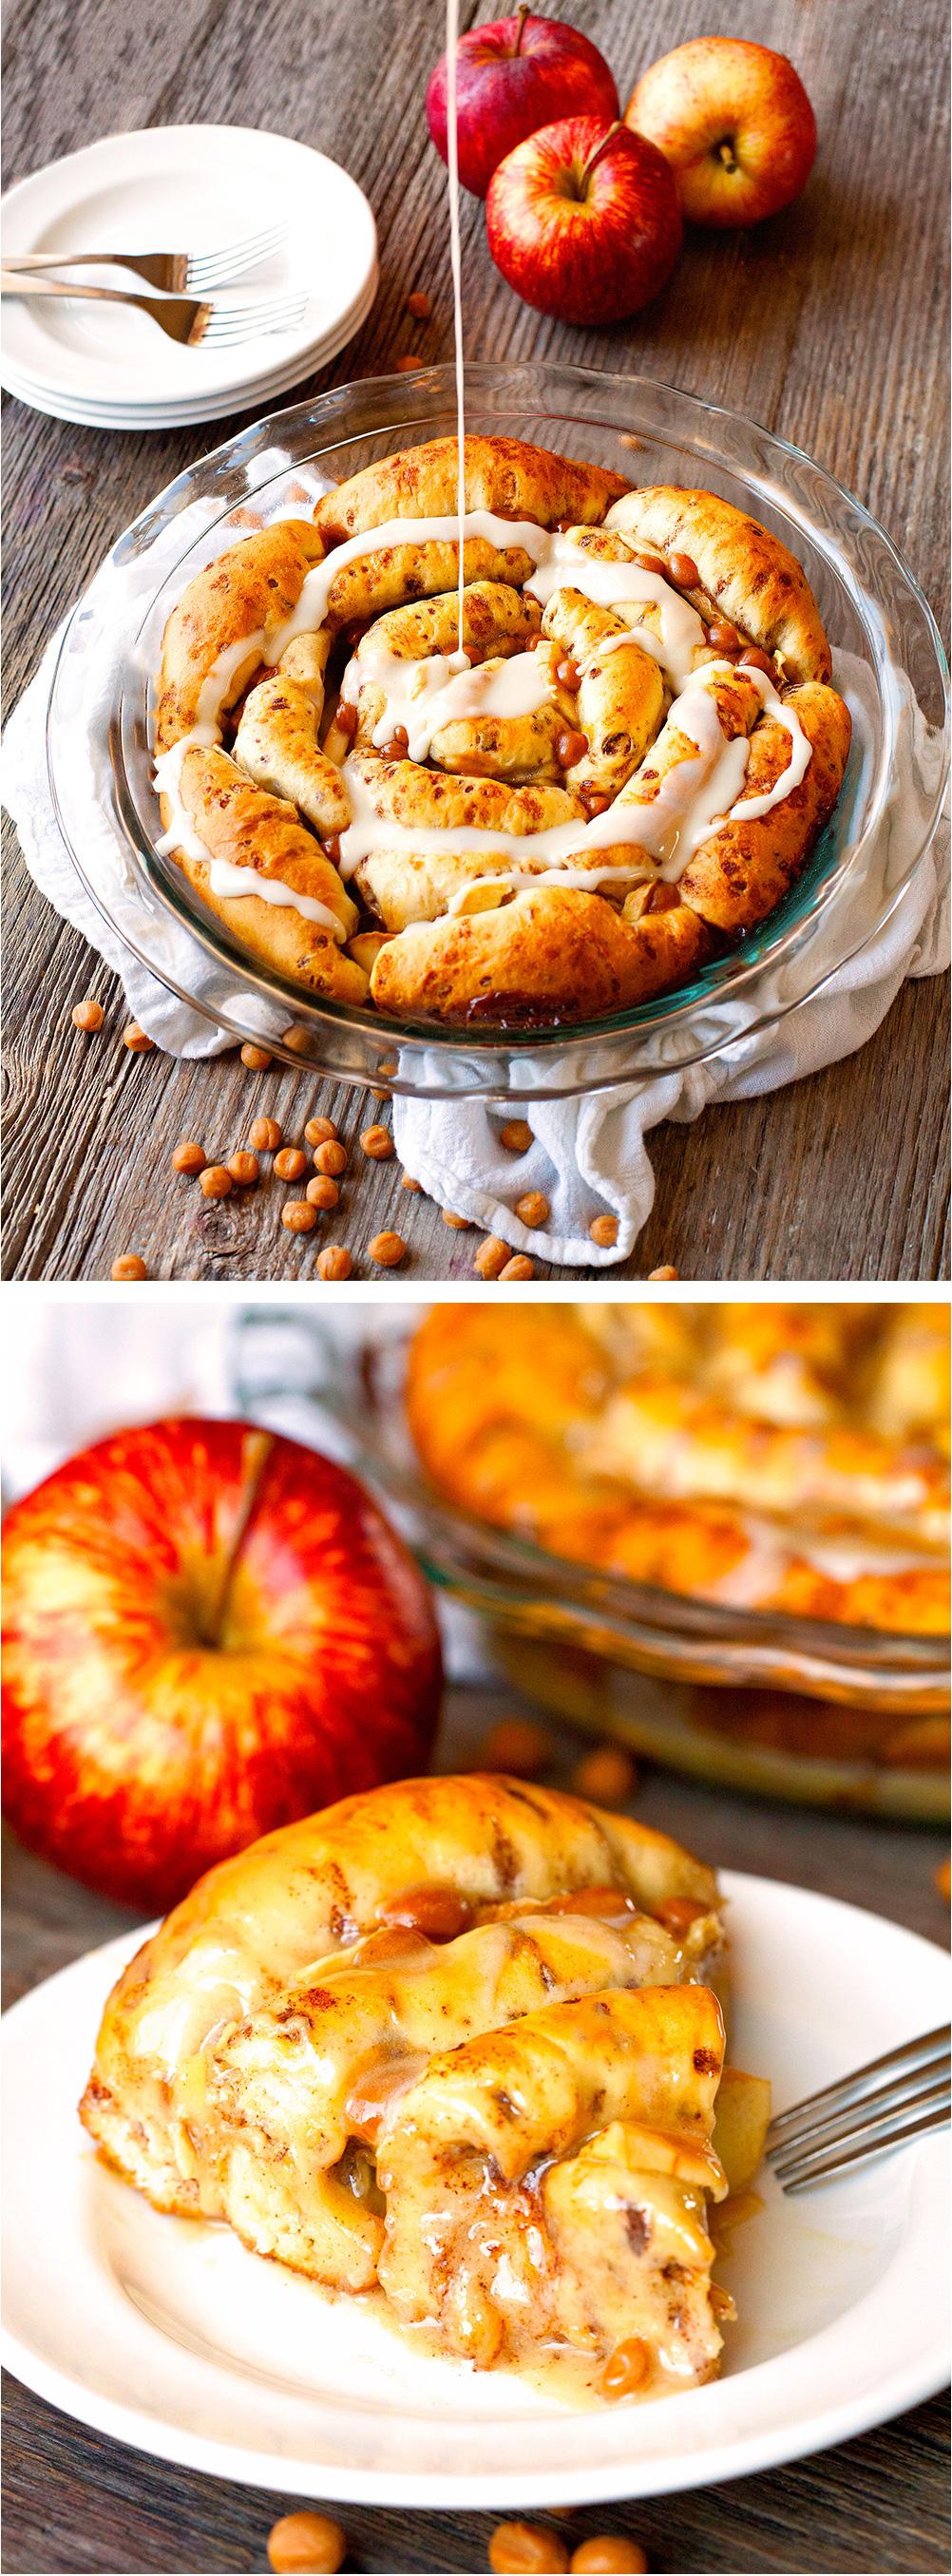 caramel-apple-cinnamon-roll-pie